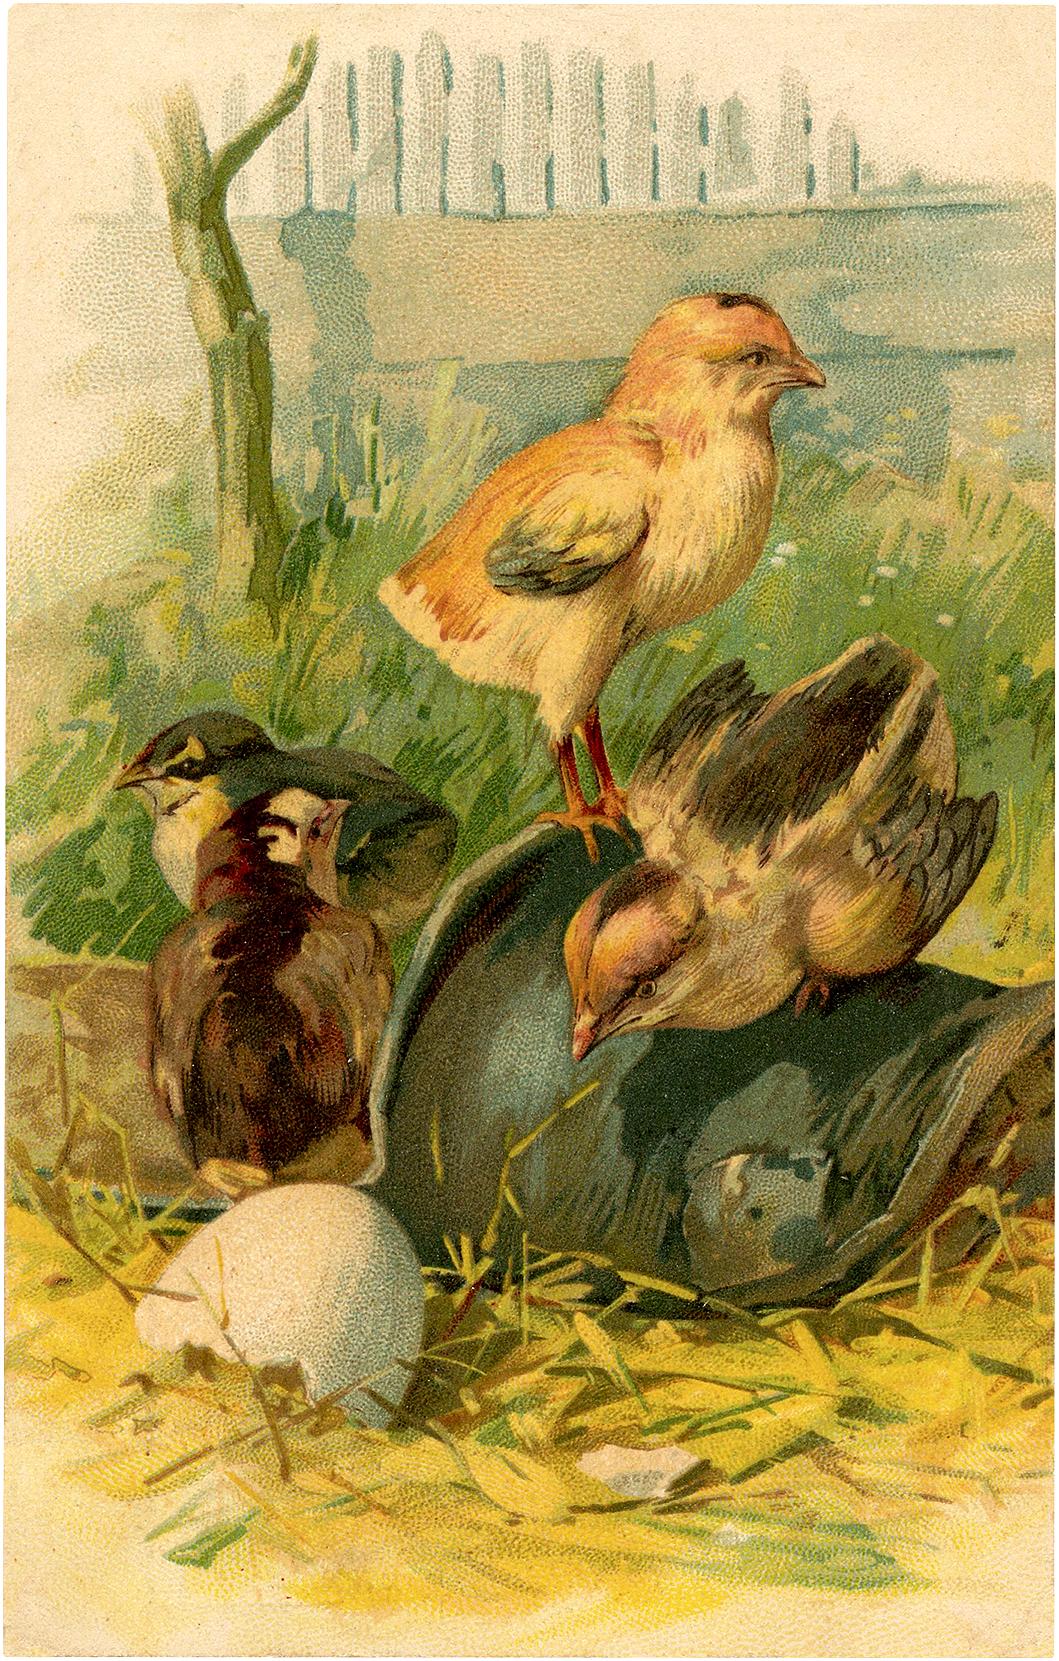 Vintage Hatching Chicks Image